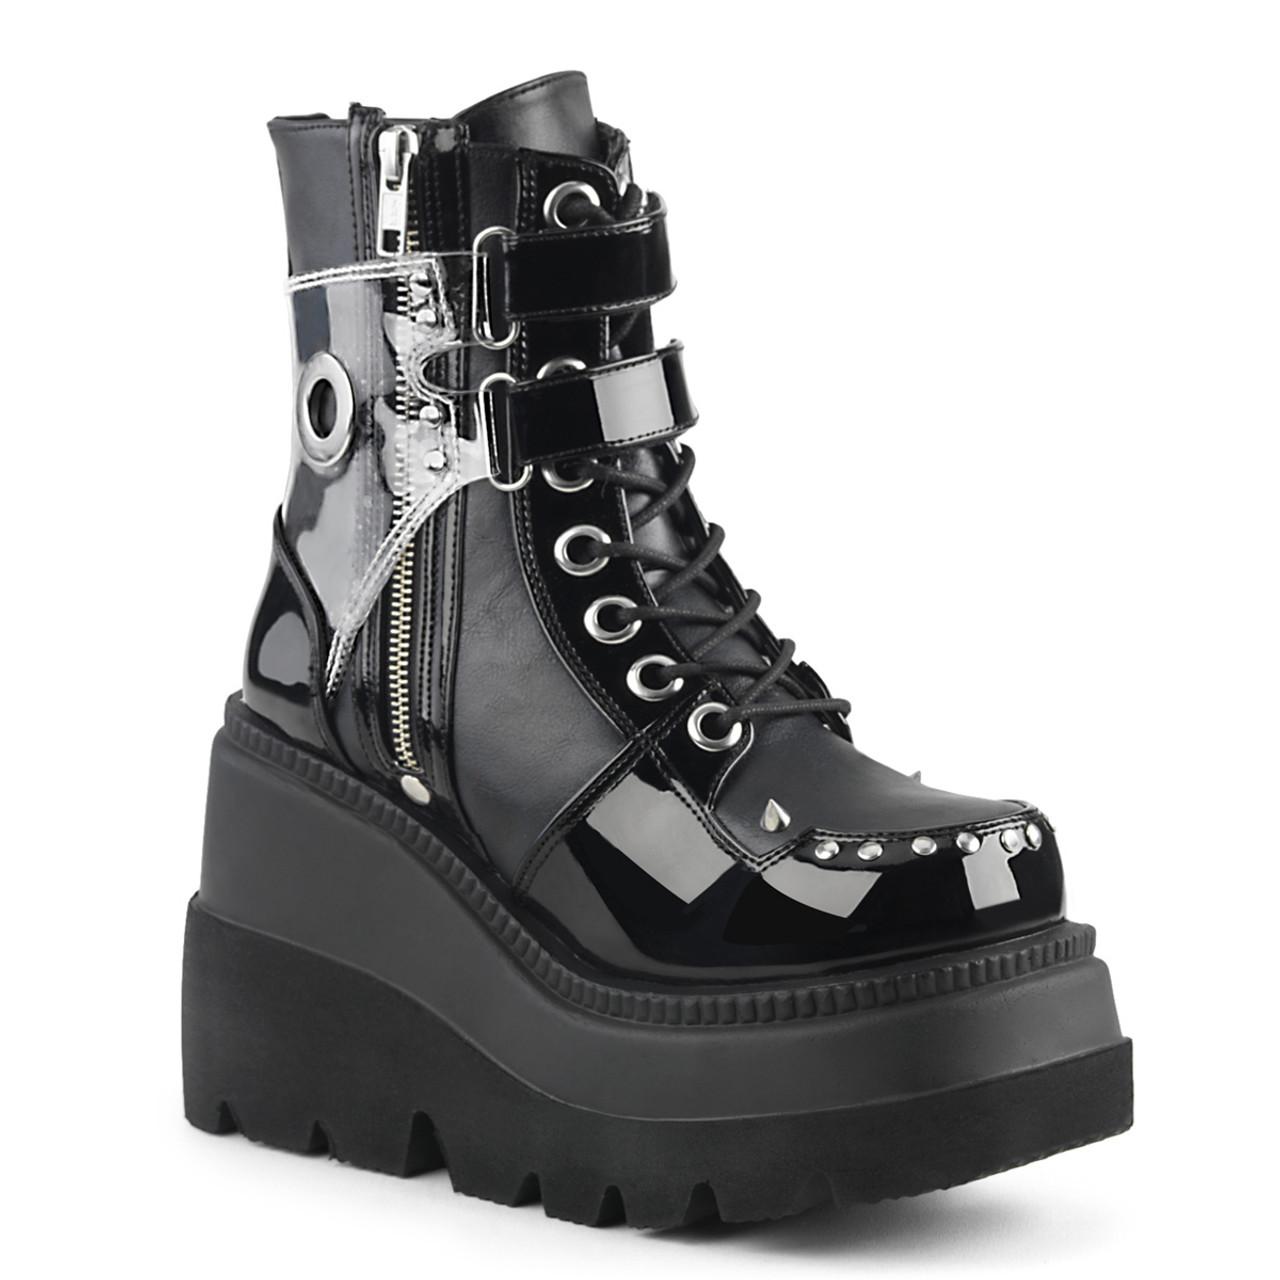 3b449e7141209 Demonia Shaker-57, Wedge Ankle Boots